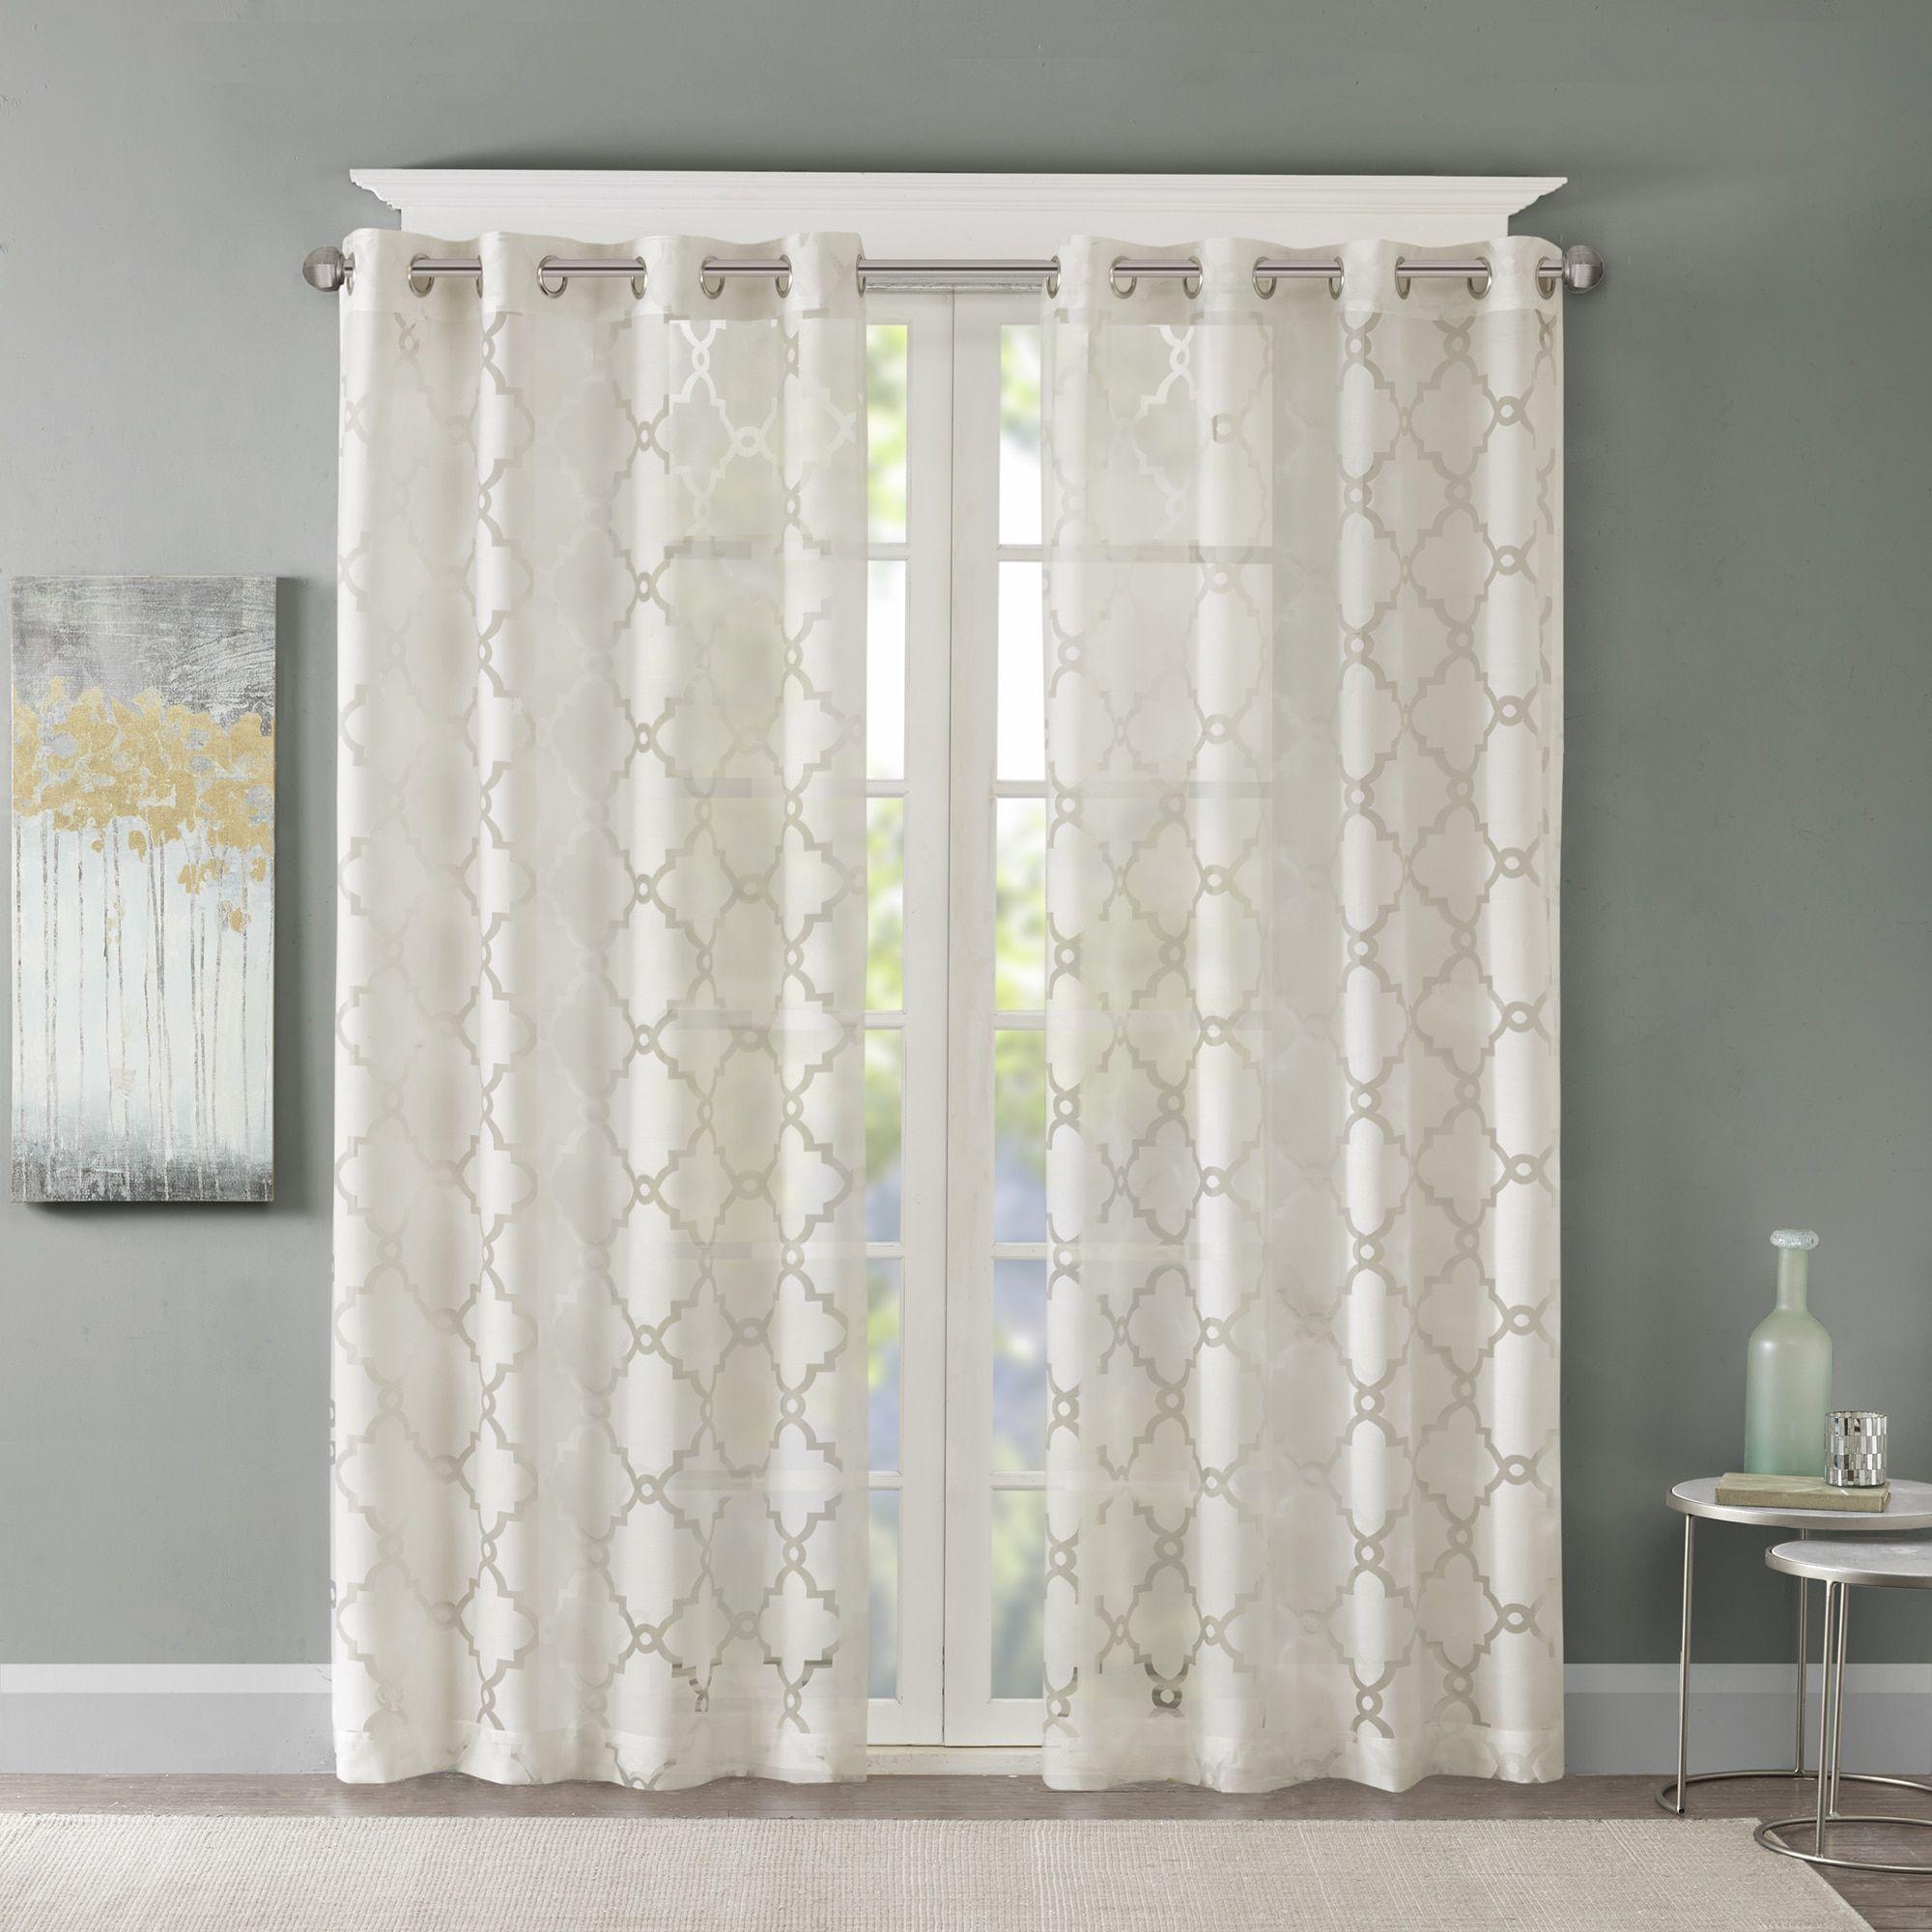 Madison Park Laya Fretwork Burnout Sheer Curtain Panel Panel